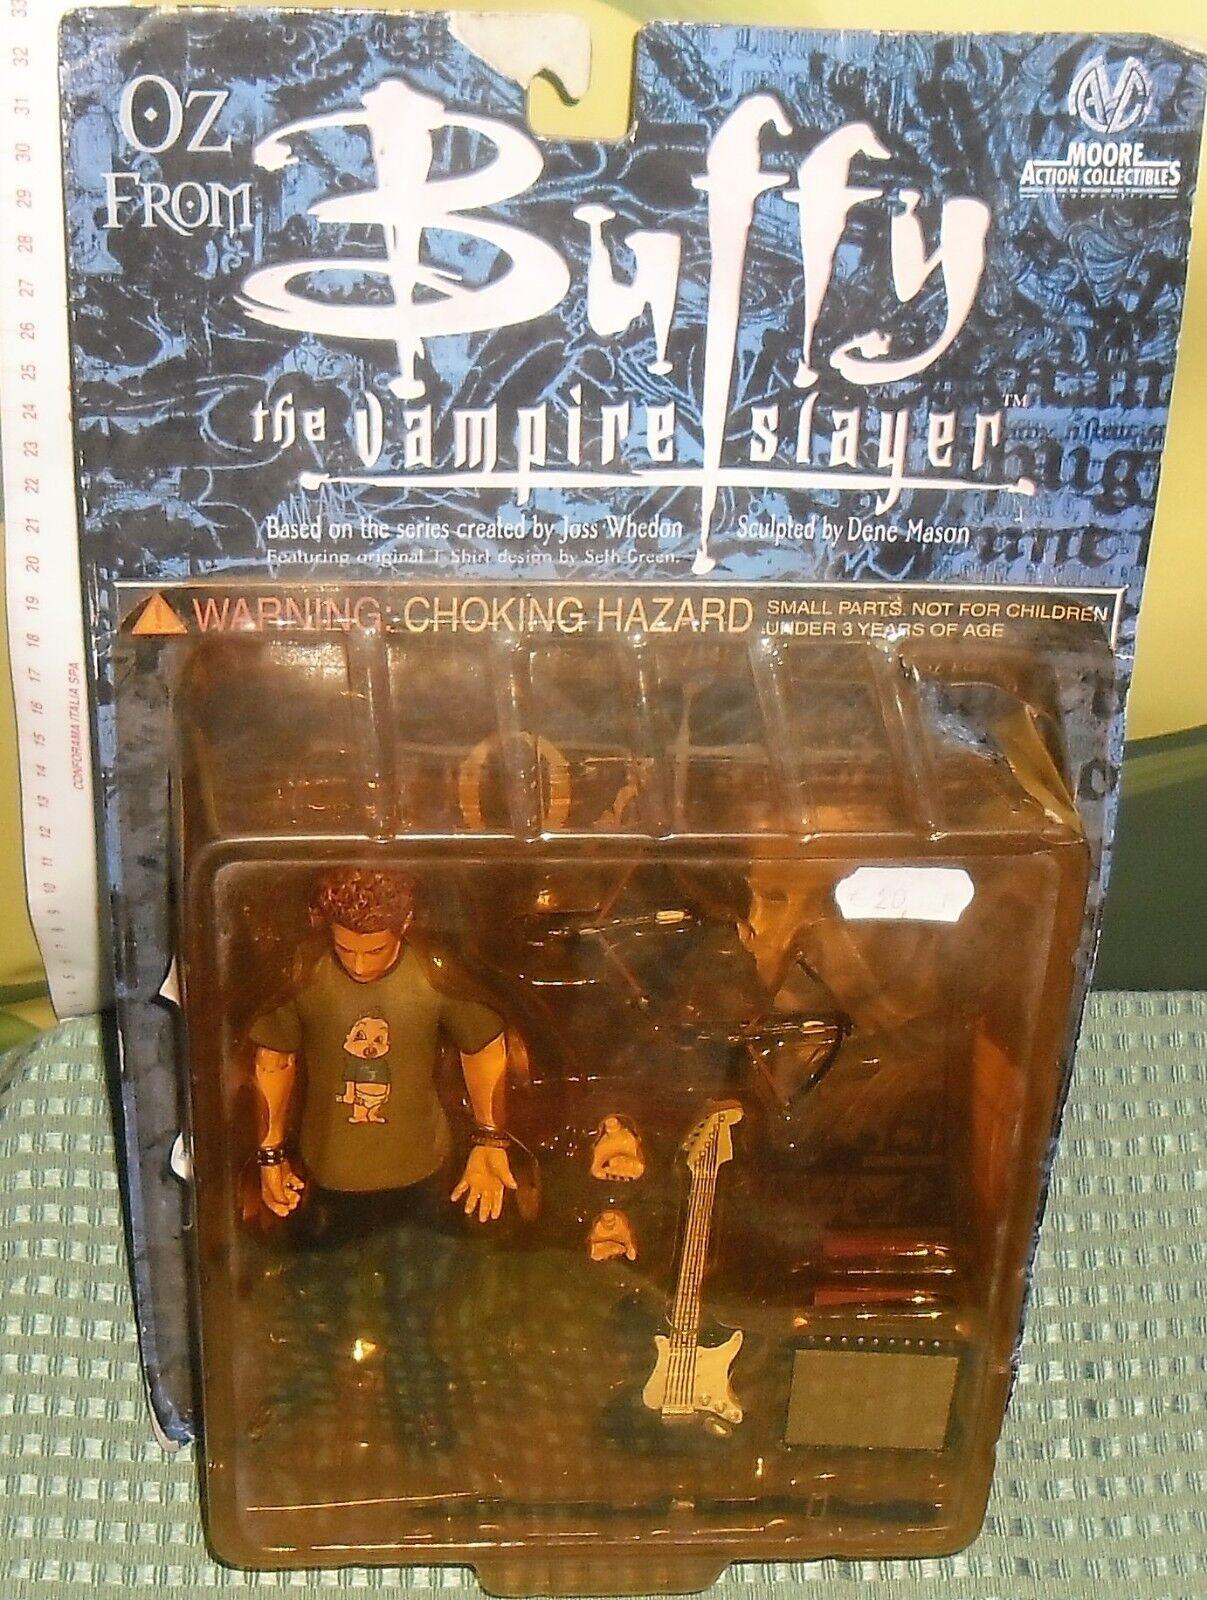 Abbildung serie tv 90 buffy l'ammazza vampiri   der vampir slayer-werewolf   oz seth